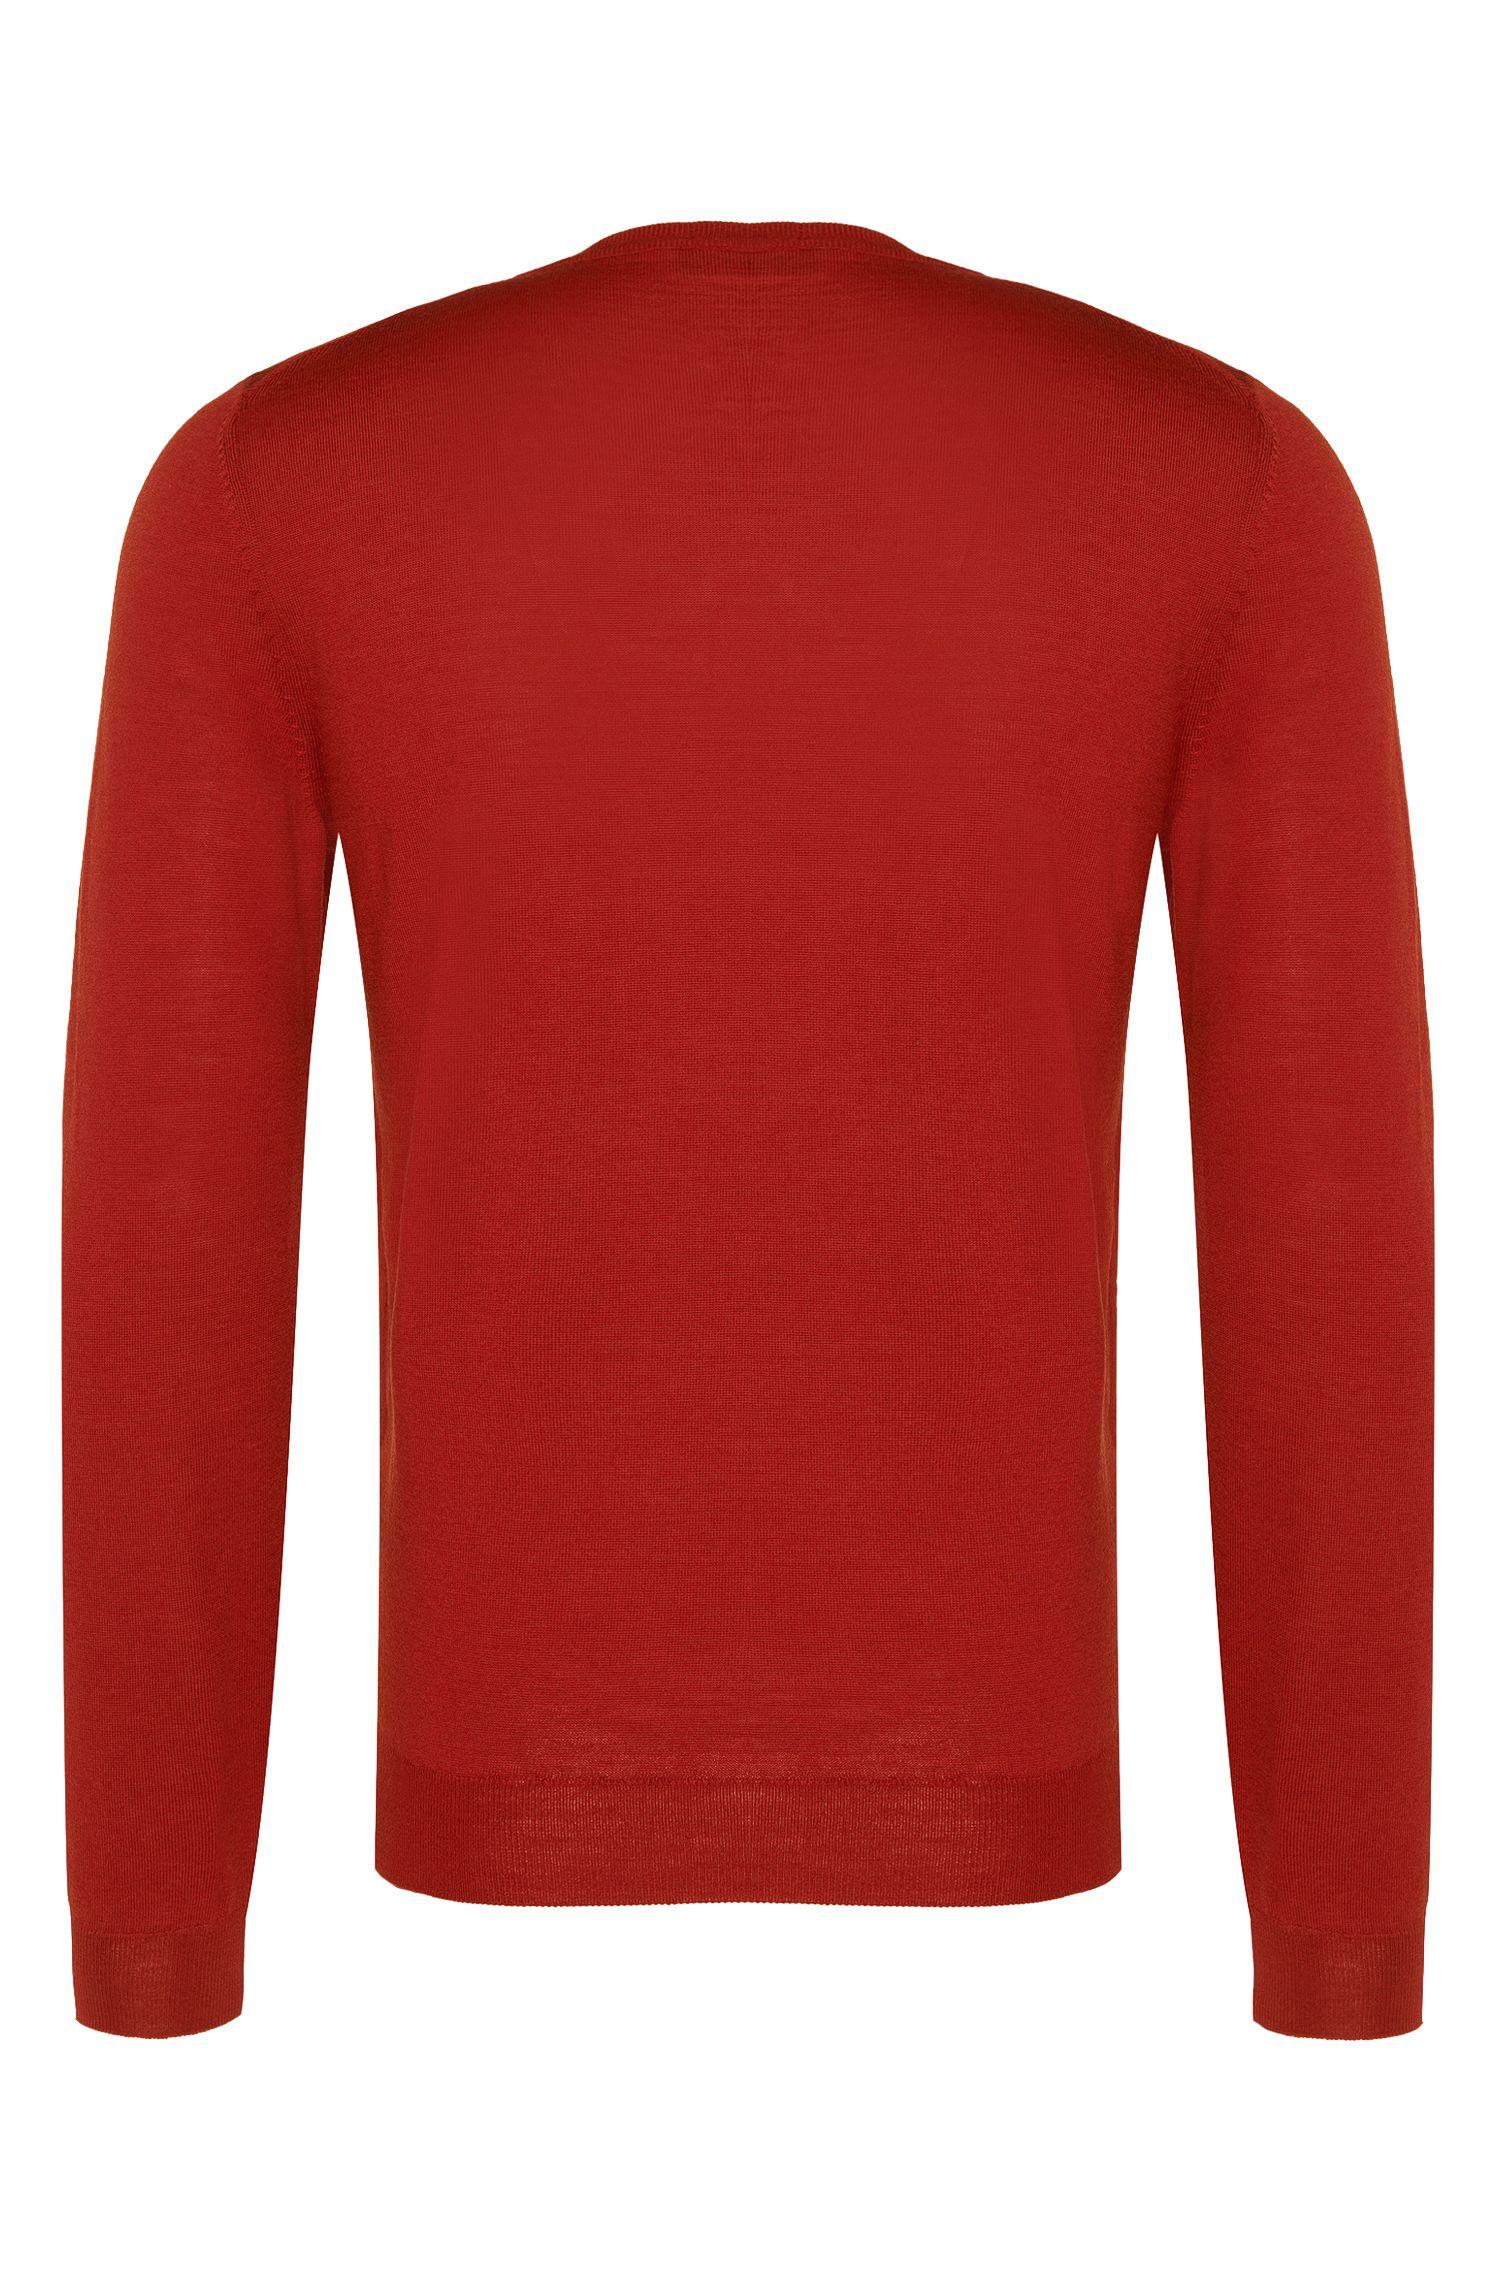 Unifarbener Slim-Fit Pullover aus Schurwolle: 'Leno-F'